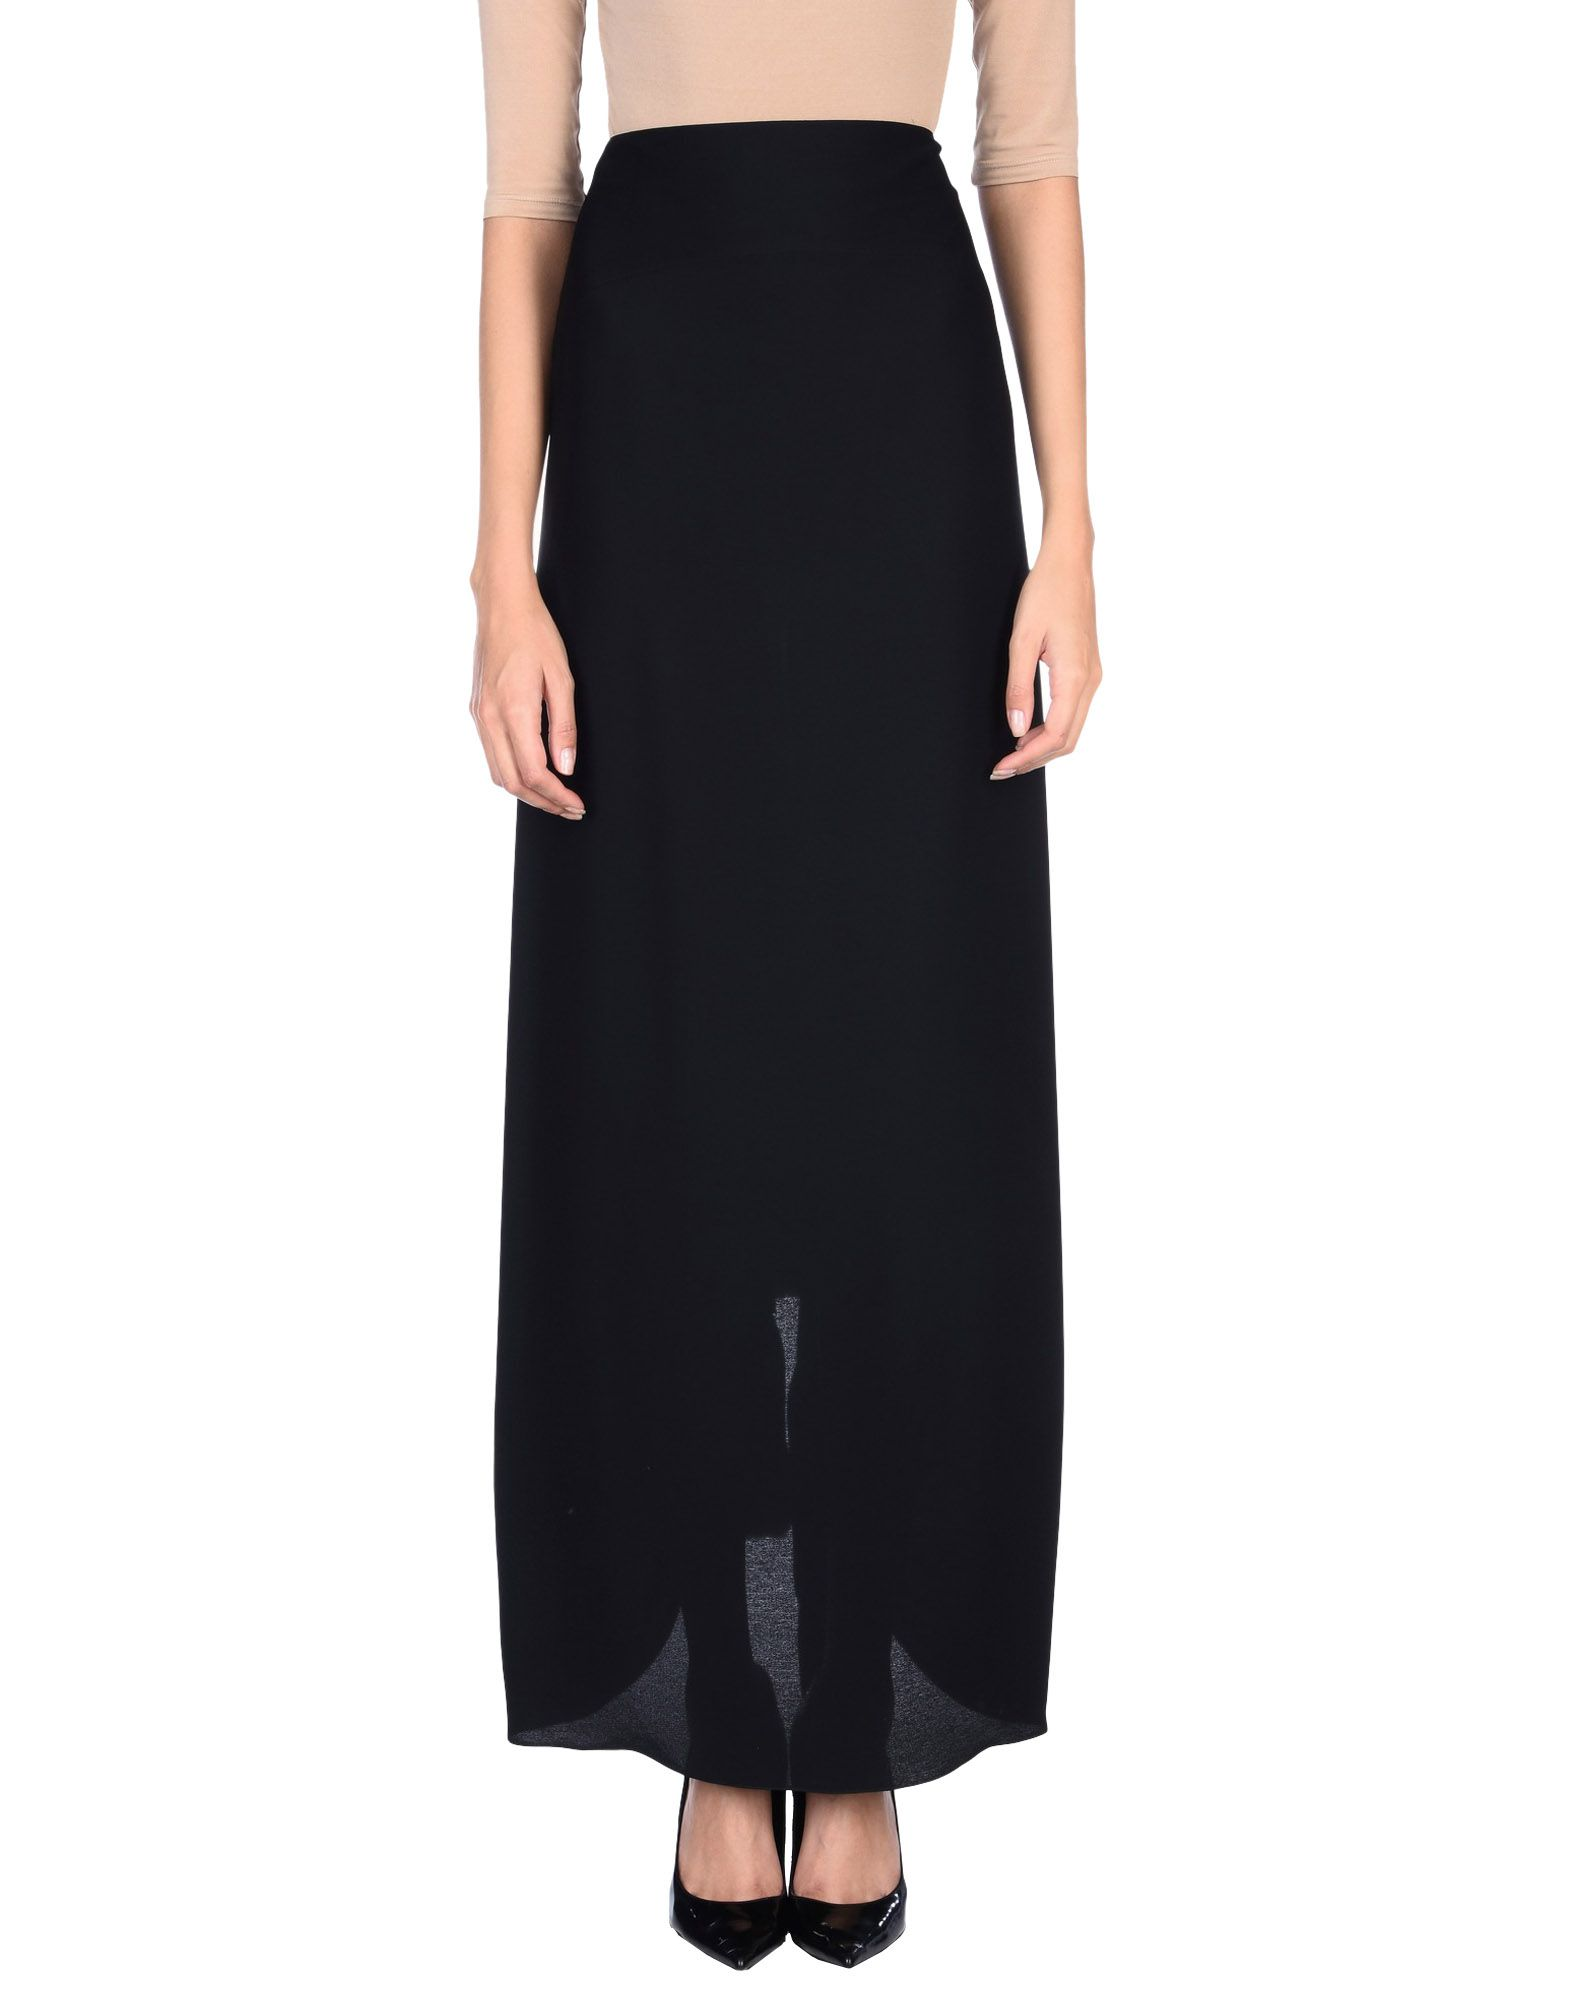 VALENTINO ROMA Длинная юбка юбка valentino roma юбки мини короткие